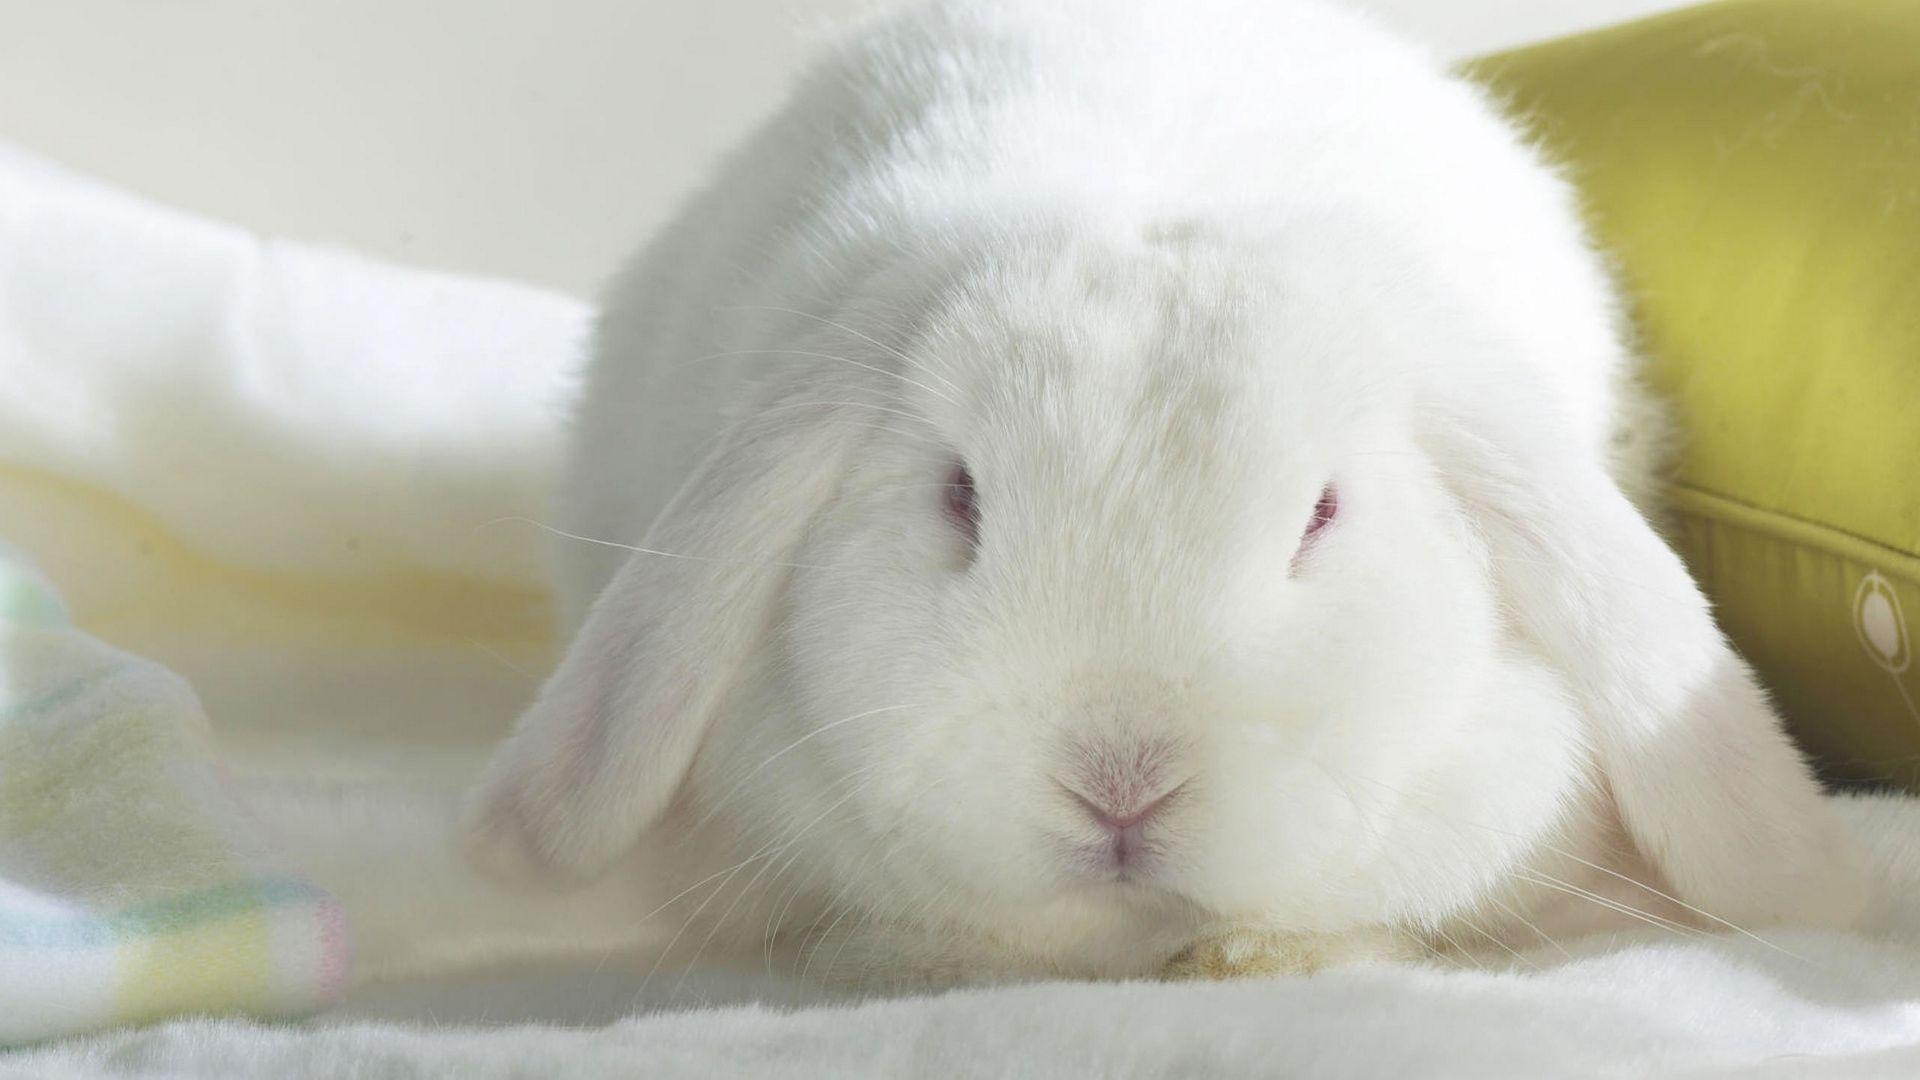 Bunny download nice wallpaper